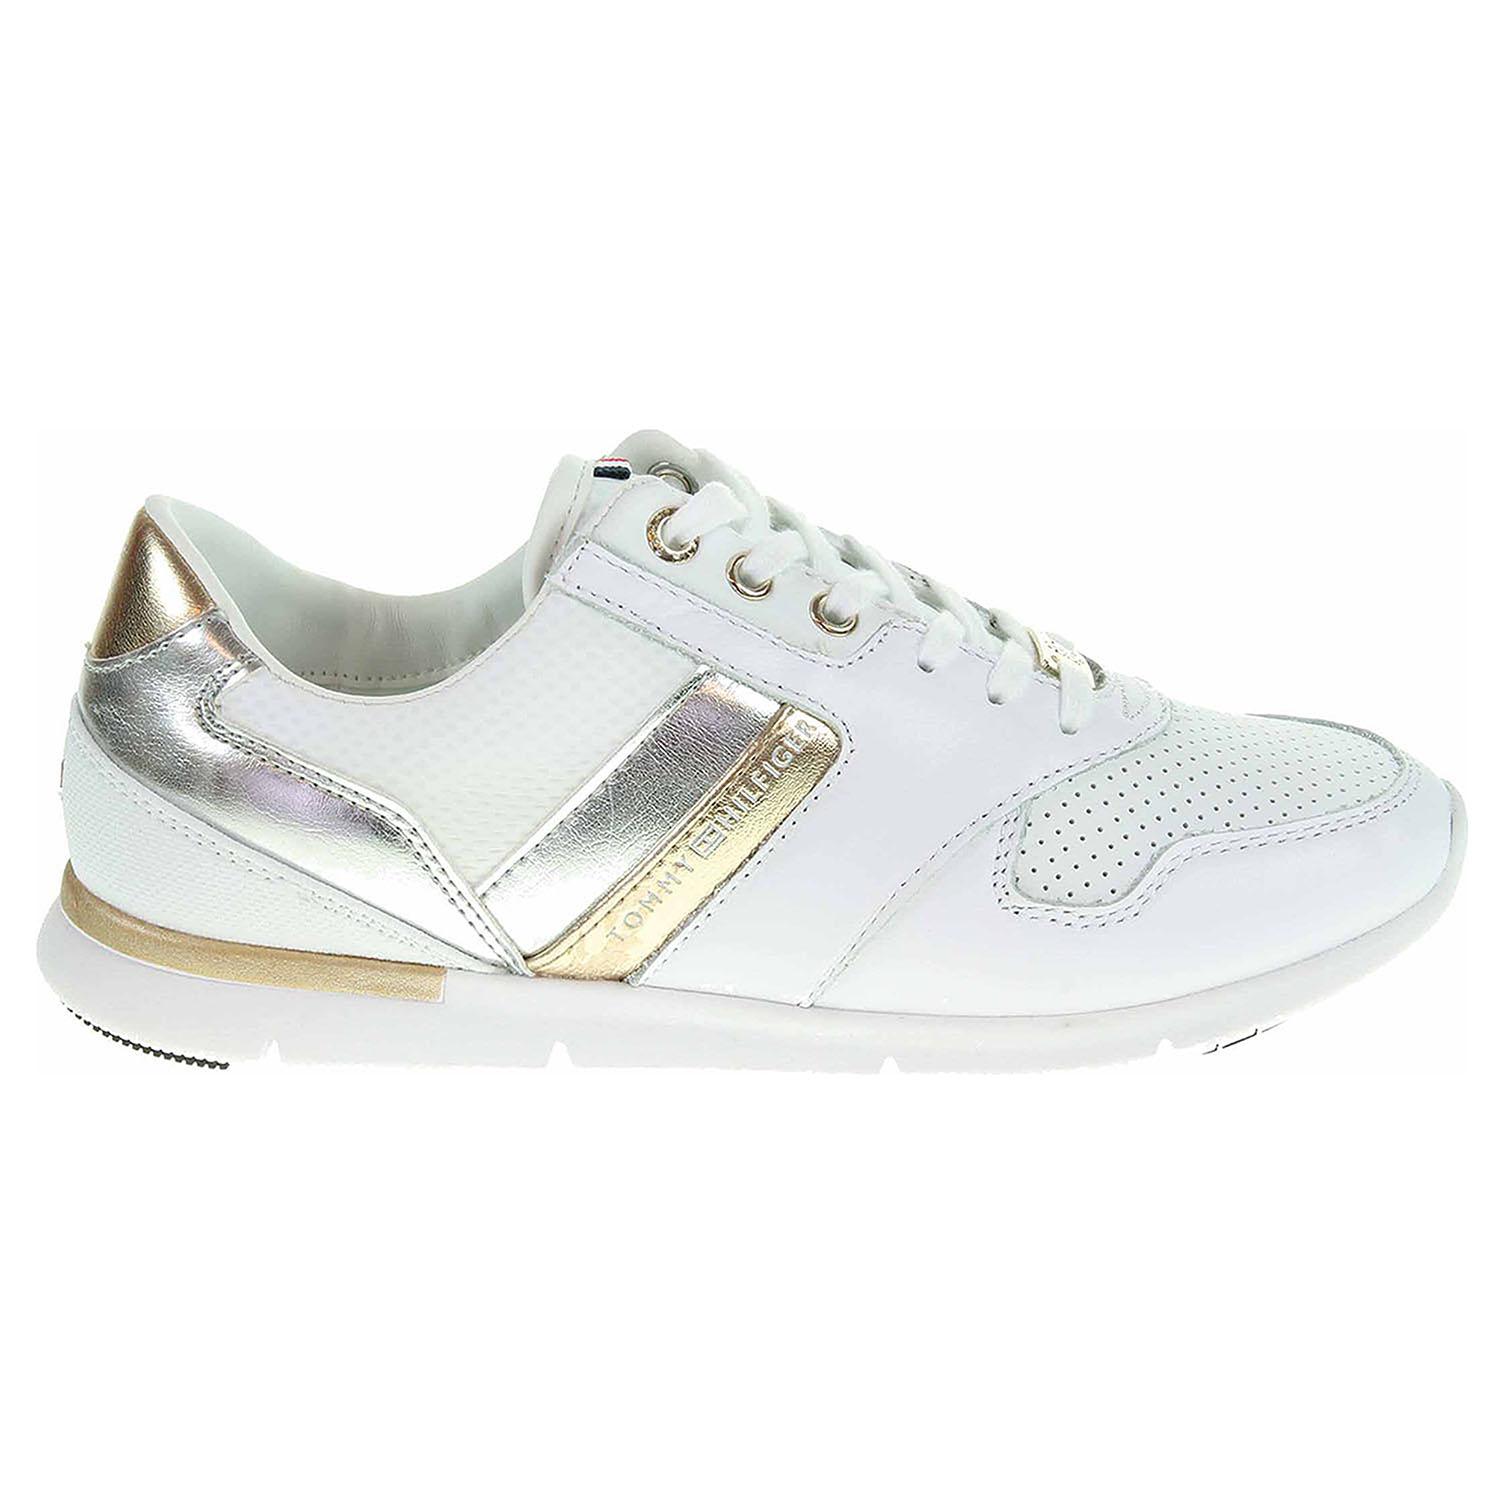 dbb53a5c2 Dámská obuv Tommy Hilfiger FW0FW02805 100 white | Rejnok obuv